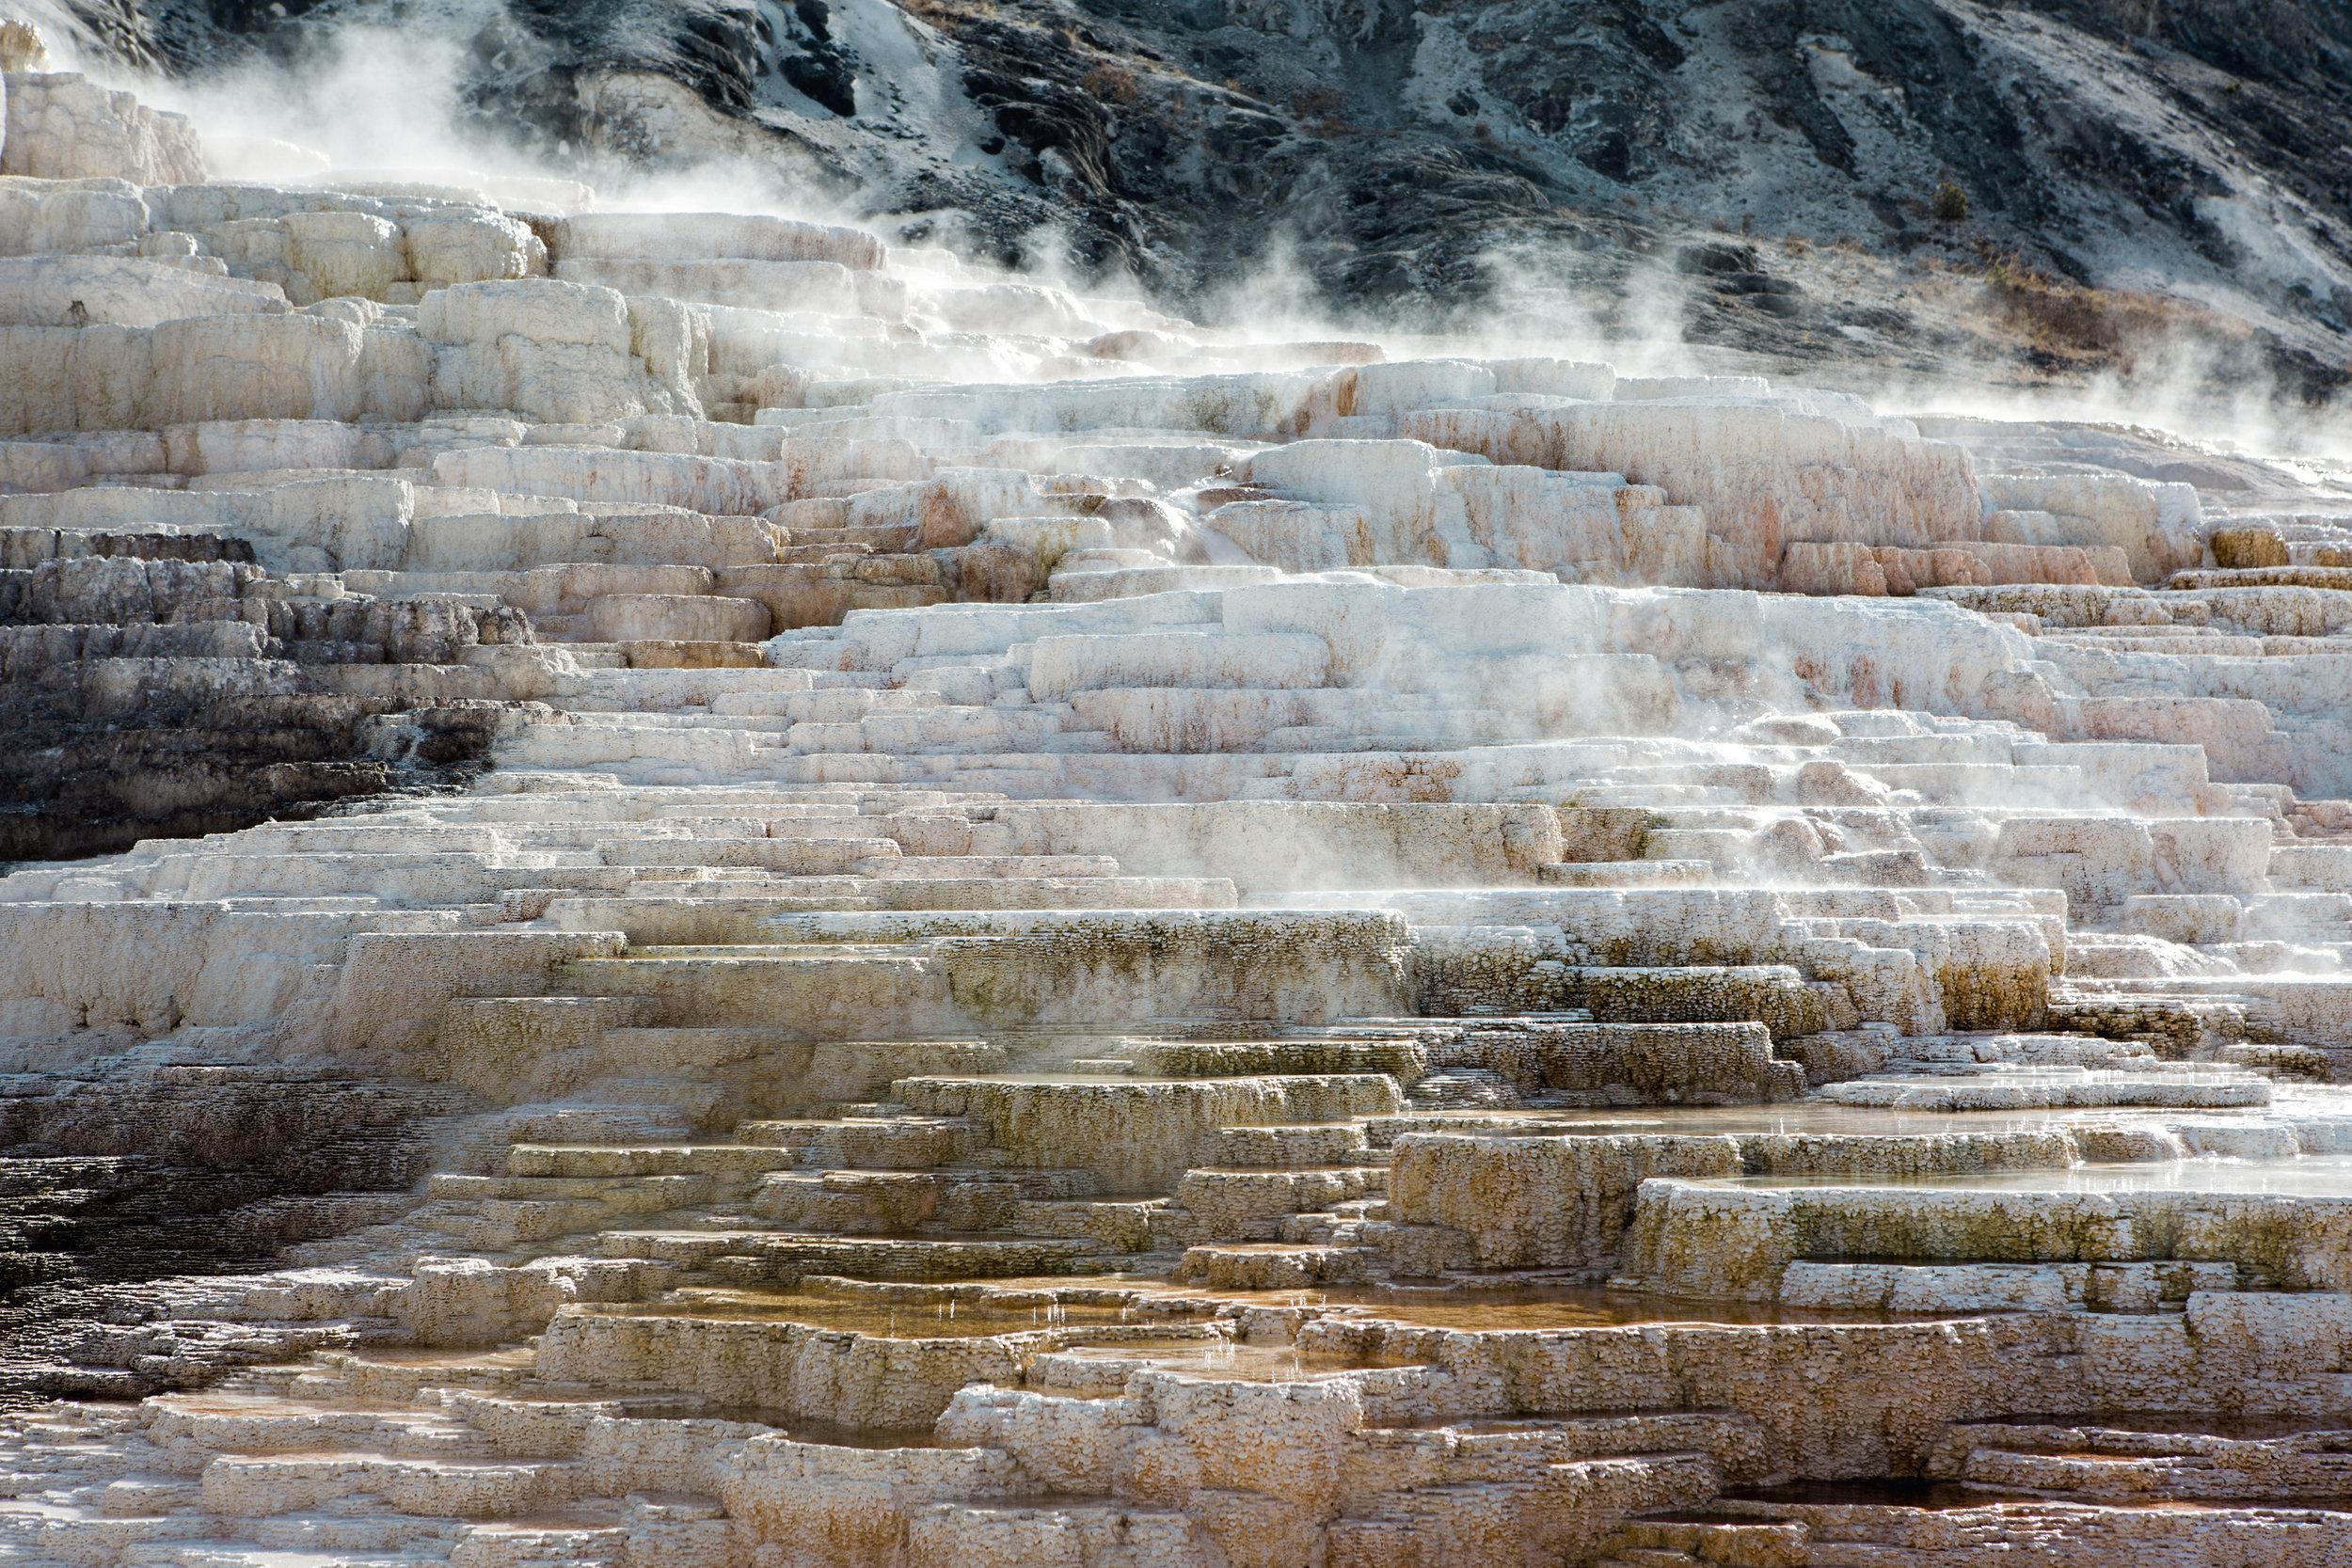 CindyGiovagnoli_Yellowstone_National_Park_Montana_Wyoming_bison_pronghorn_snow_elk_truckcamping-004.jpg